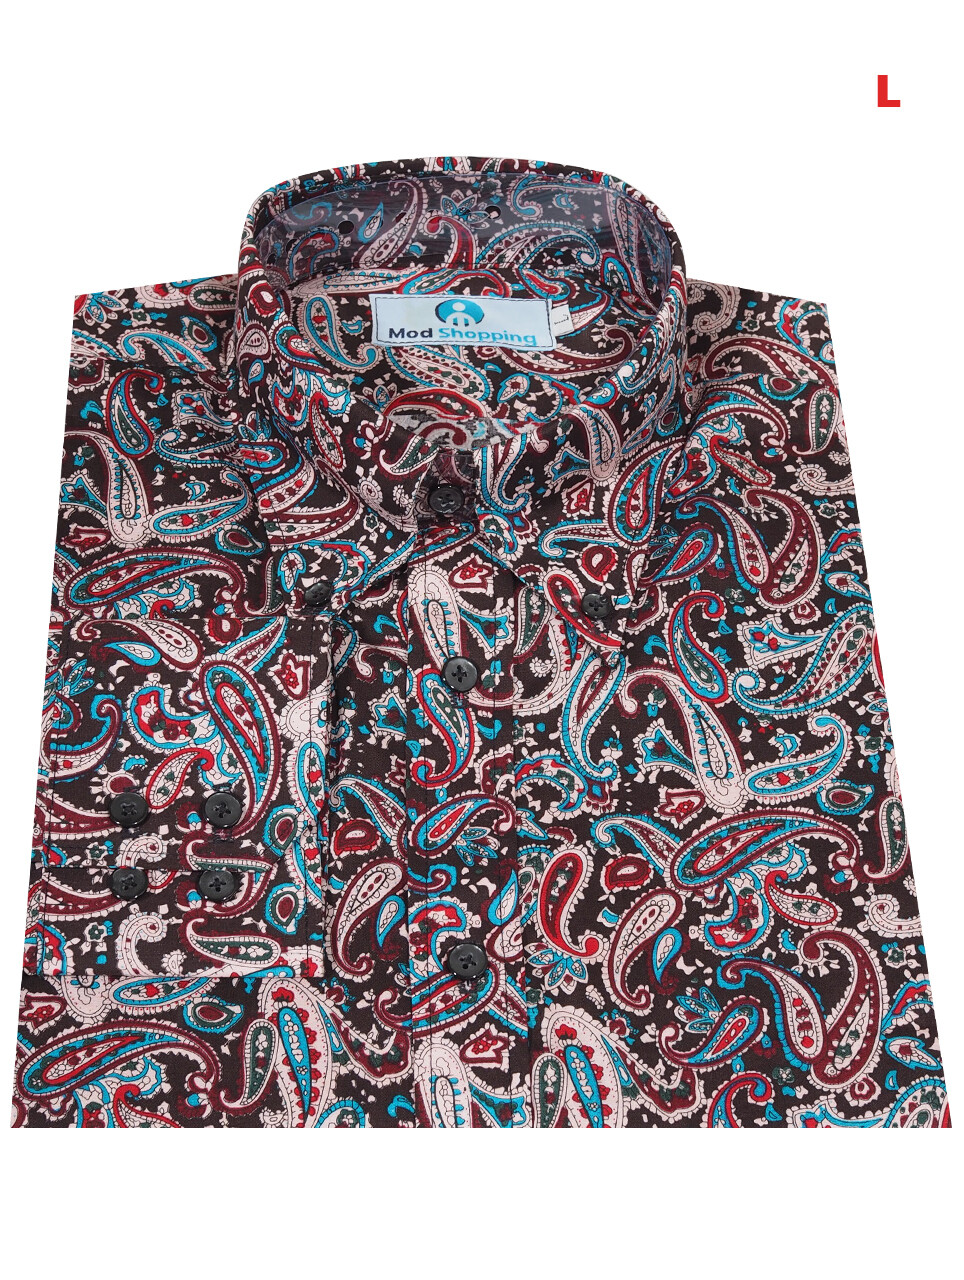 This Shirt Only. Paisley Shirt Multi Color Shirt